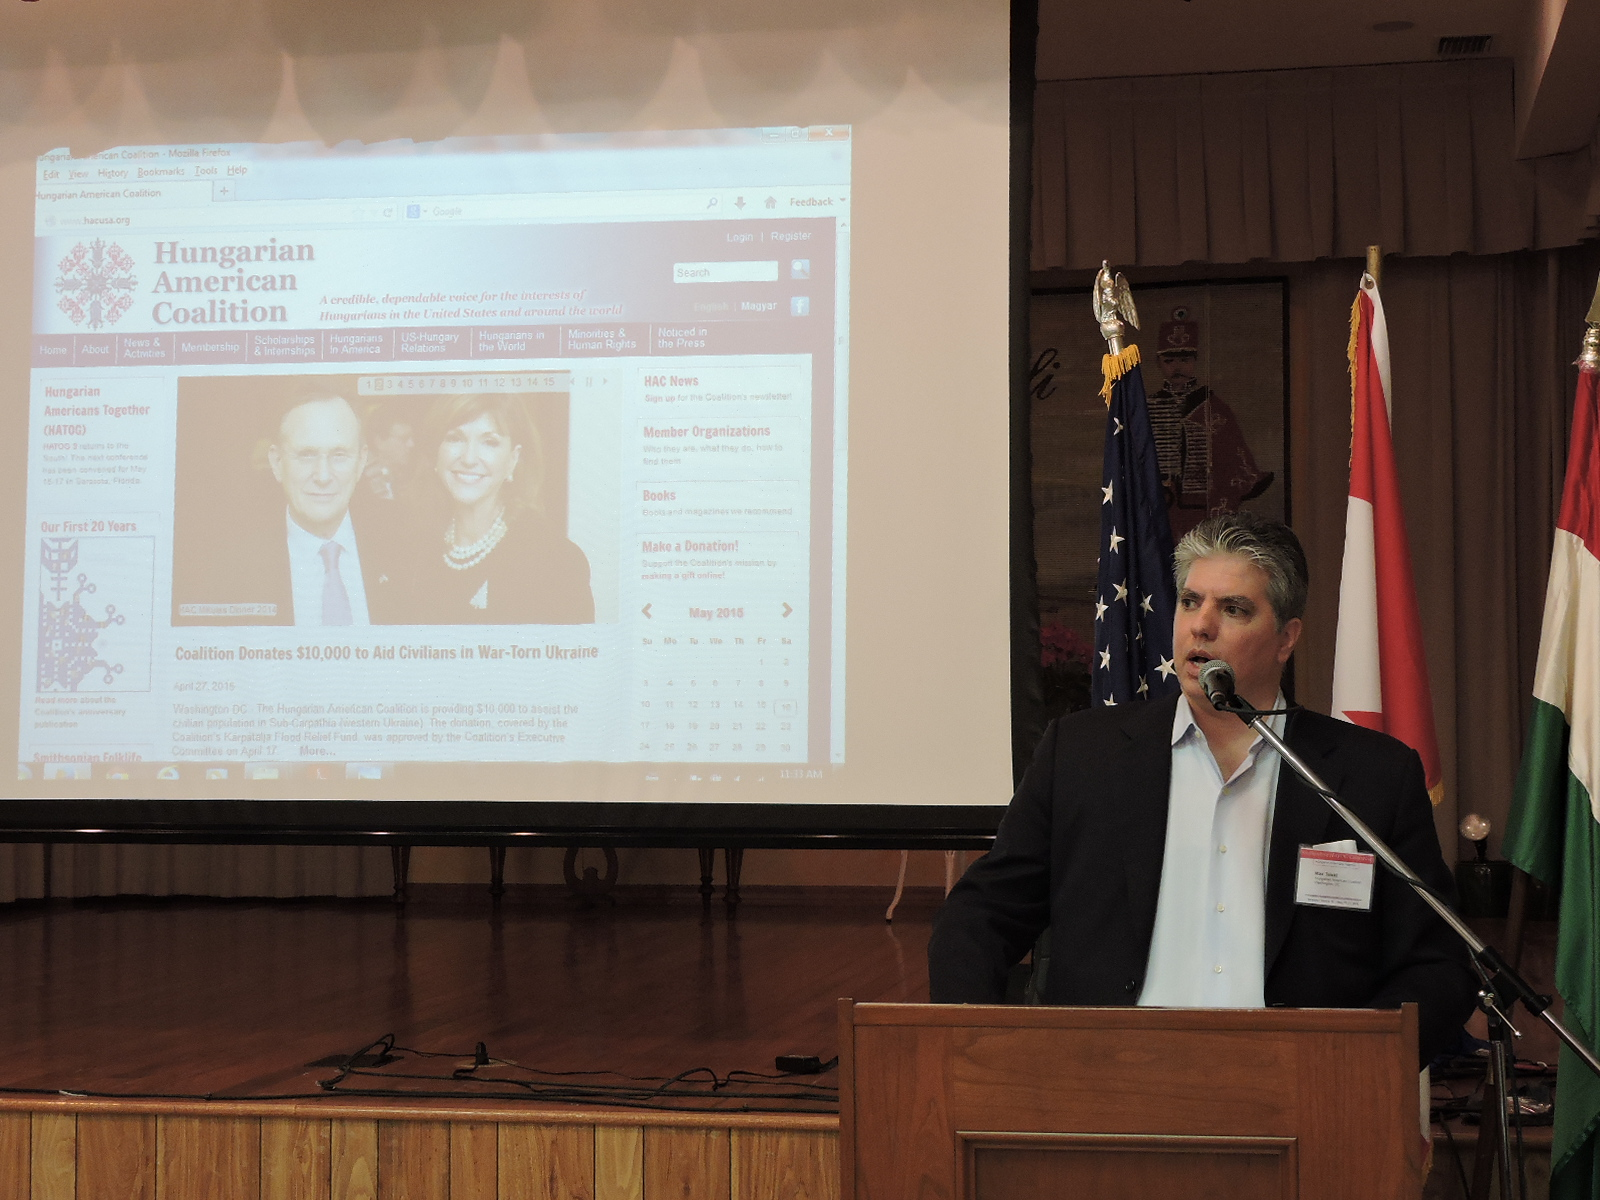 Mr. Maximilian N. Teleki presenting the work of the Hungarian american Coalition to HATOG participants